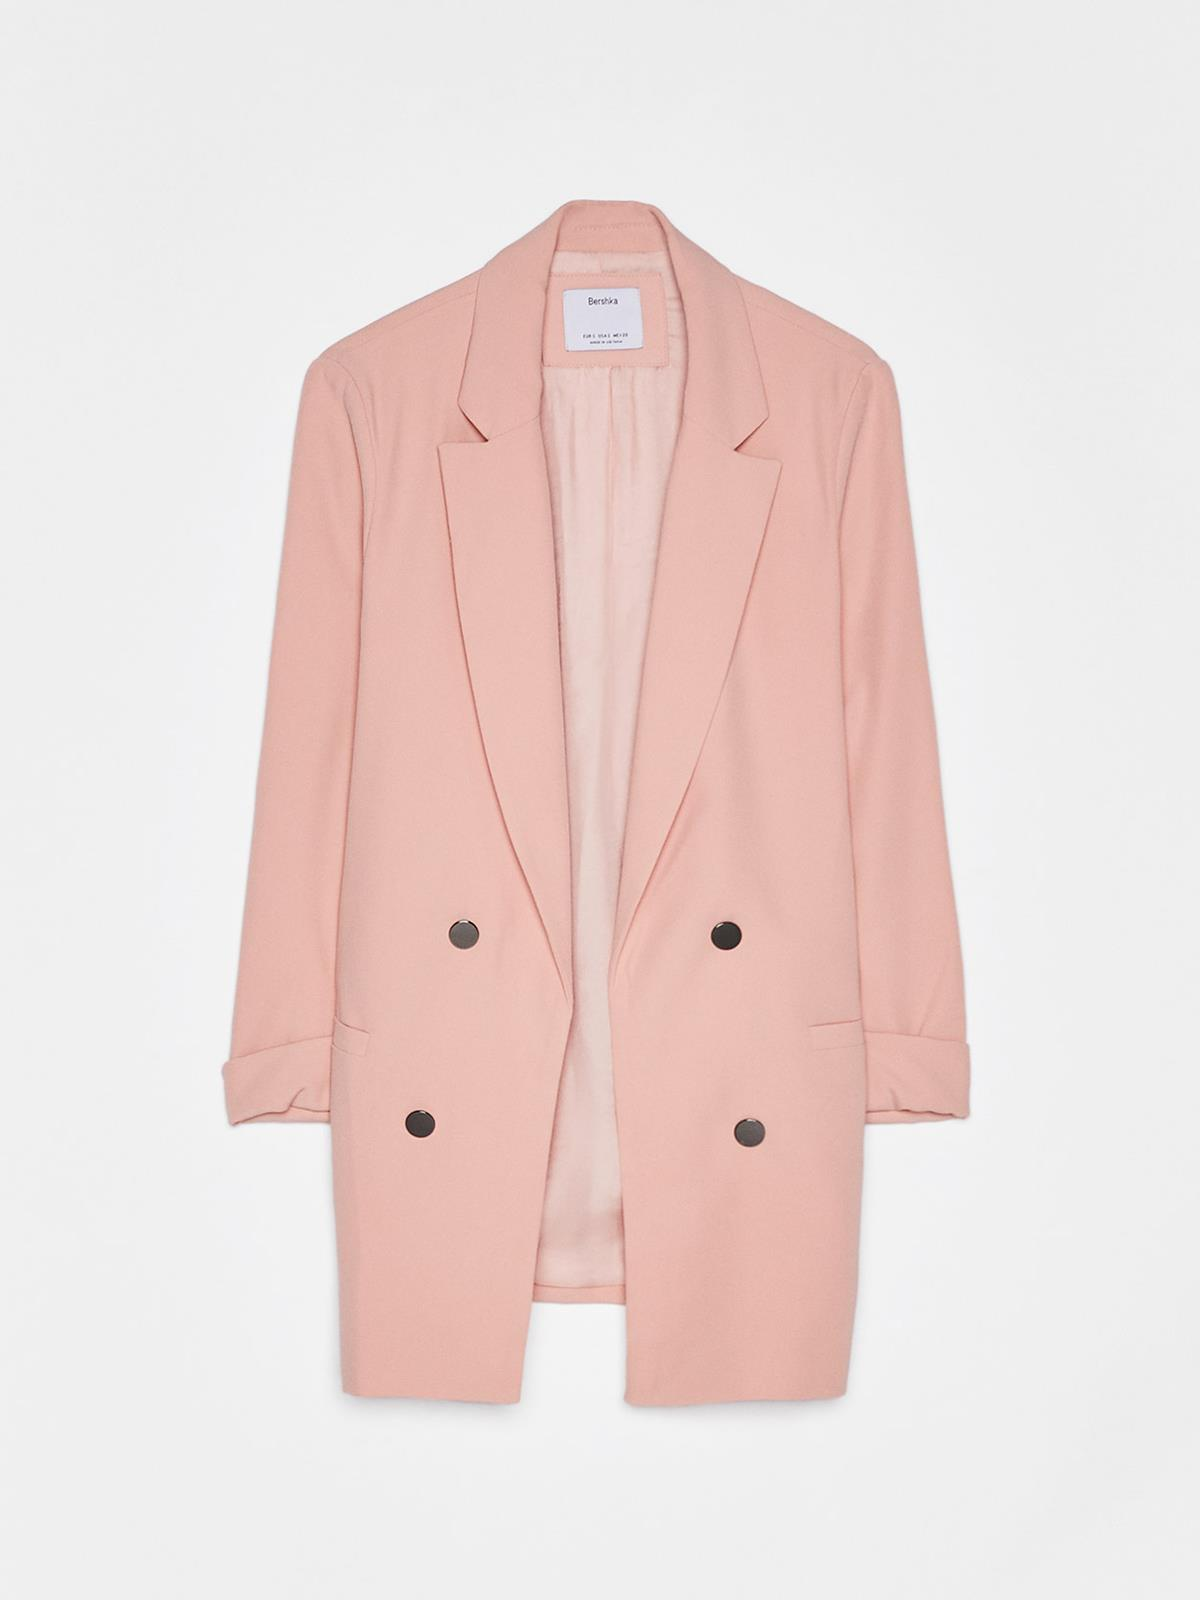 21ec17d78 blazer-rosa-bershka. Blazer rosa pastel